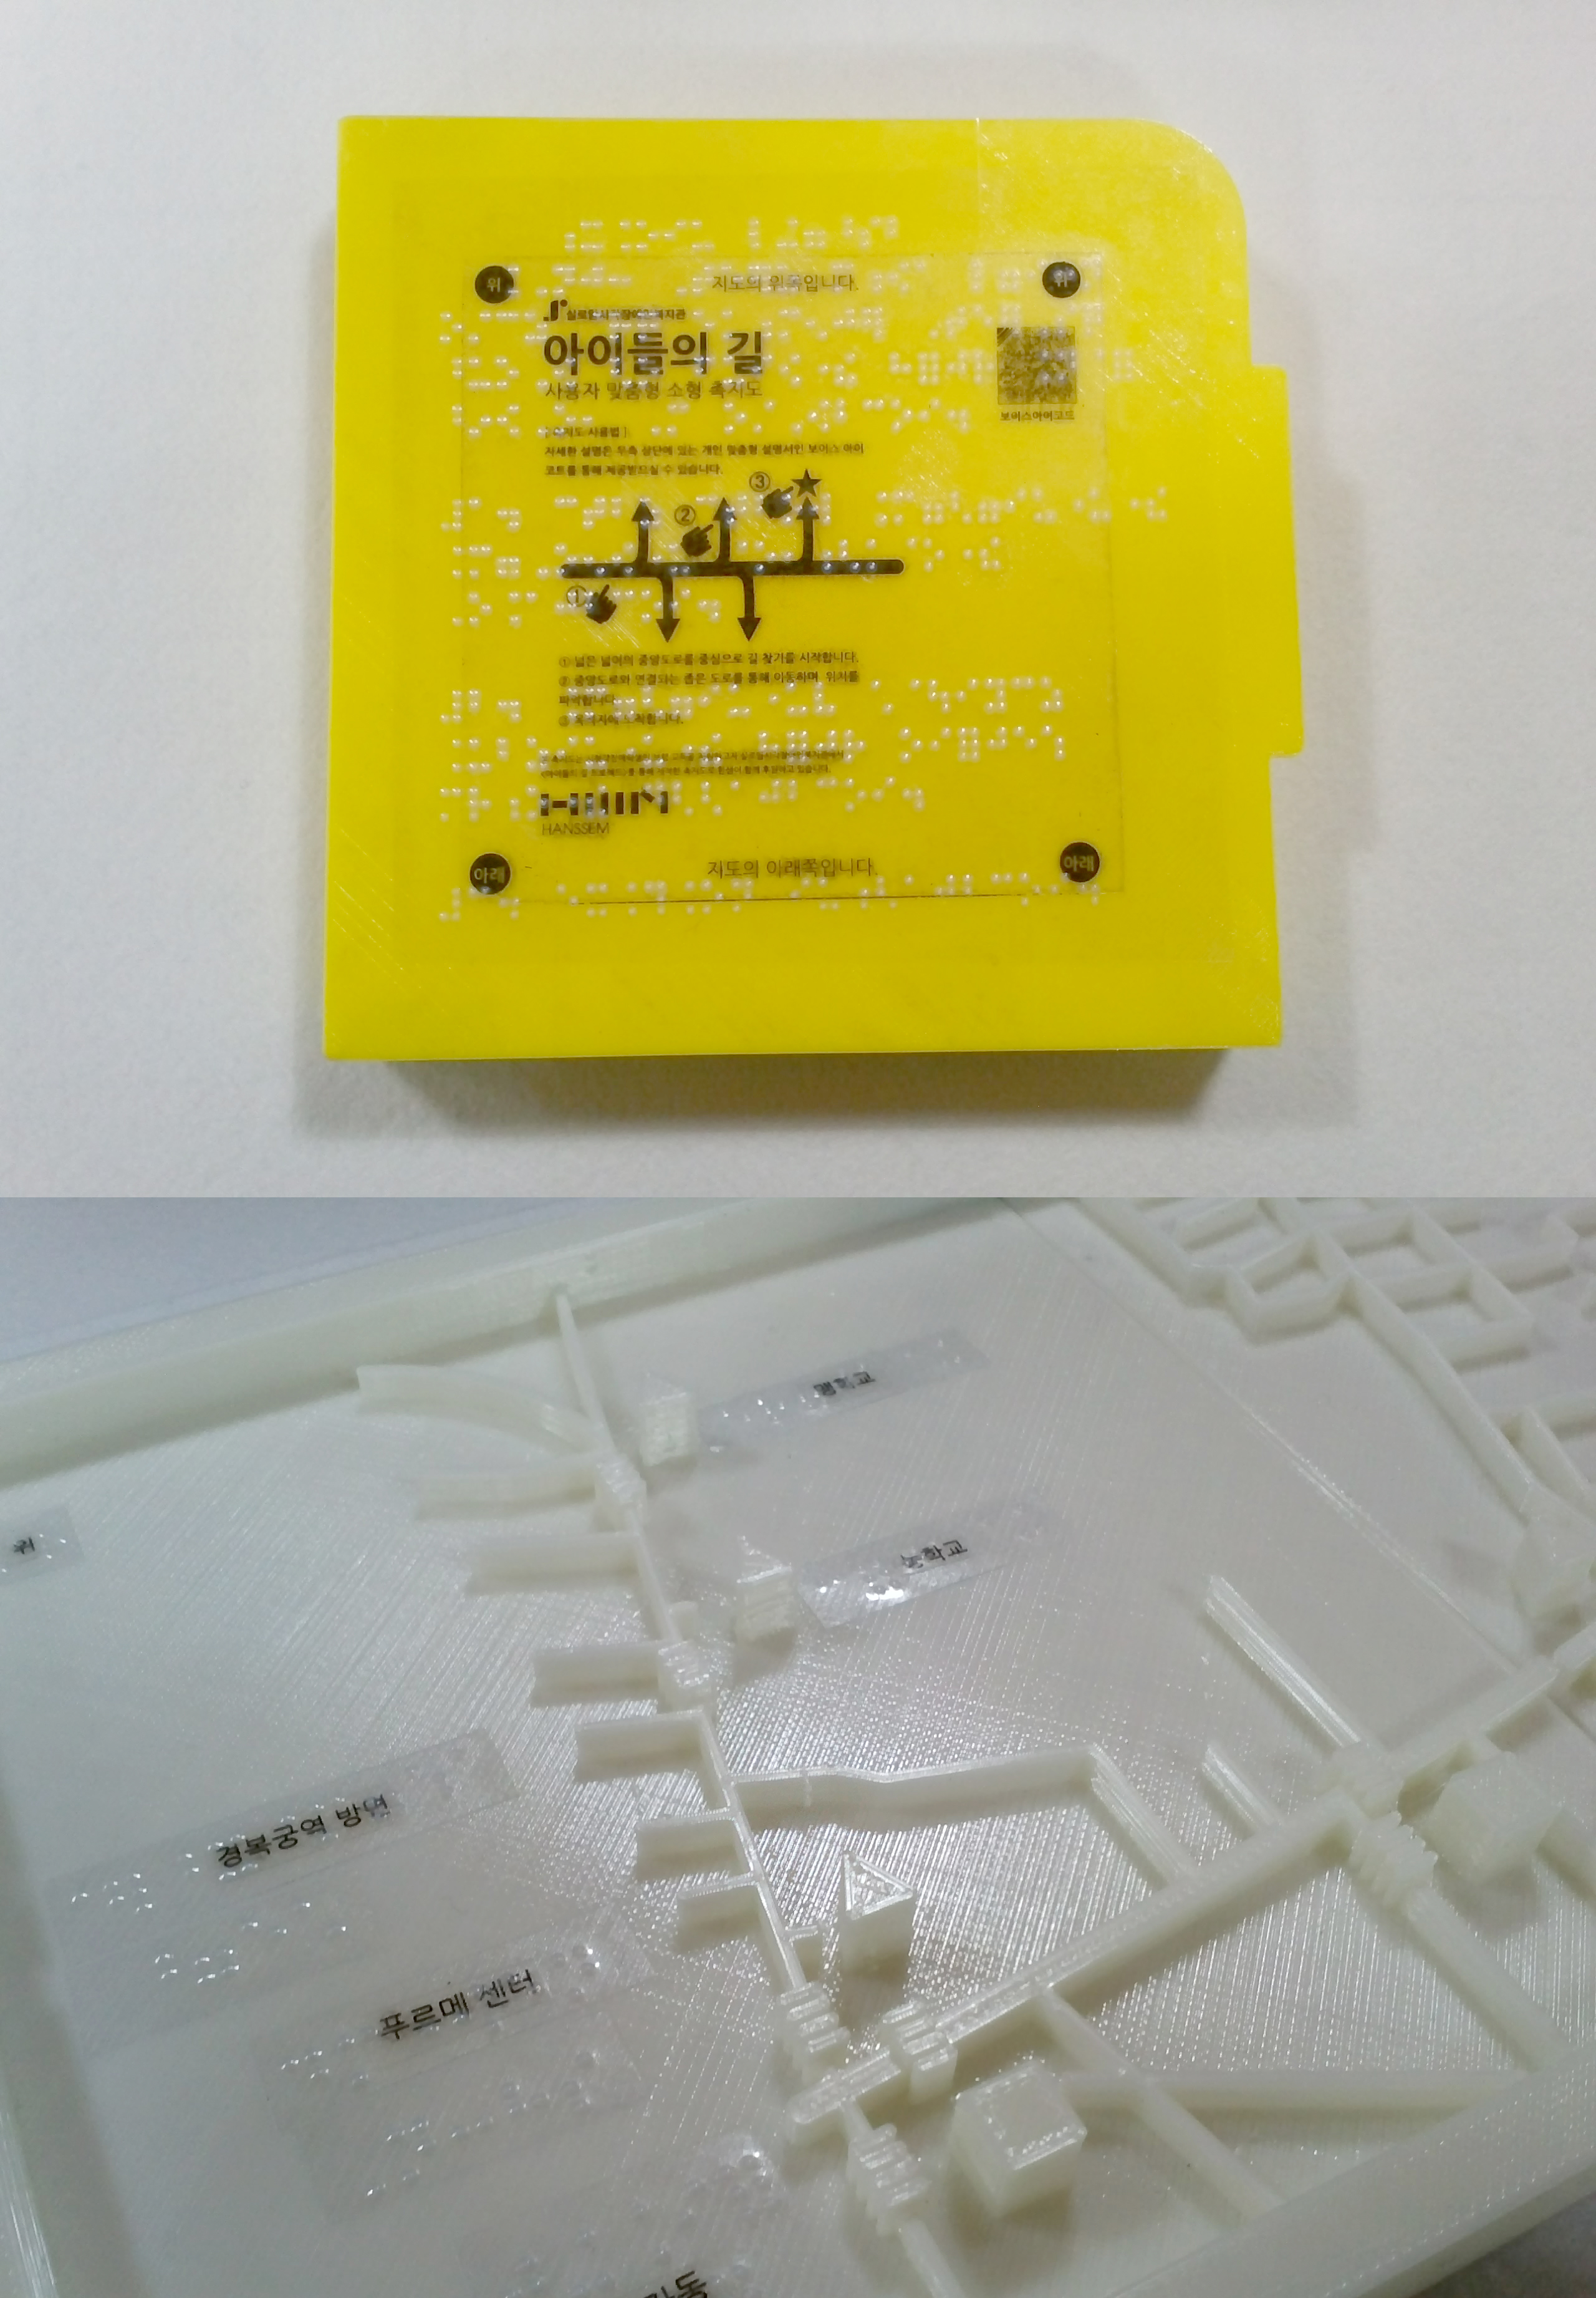 3D소형촉지도 '아이들의 길_ 학교가는길, 1,2' 썸네일